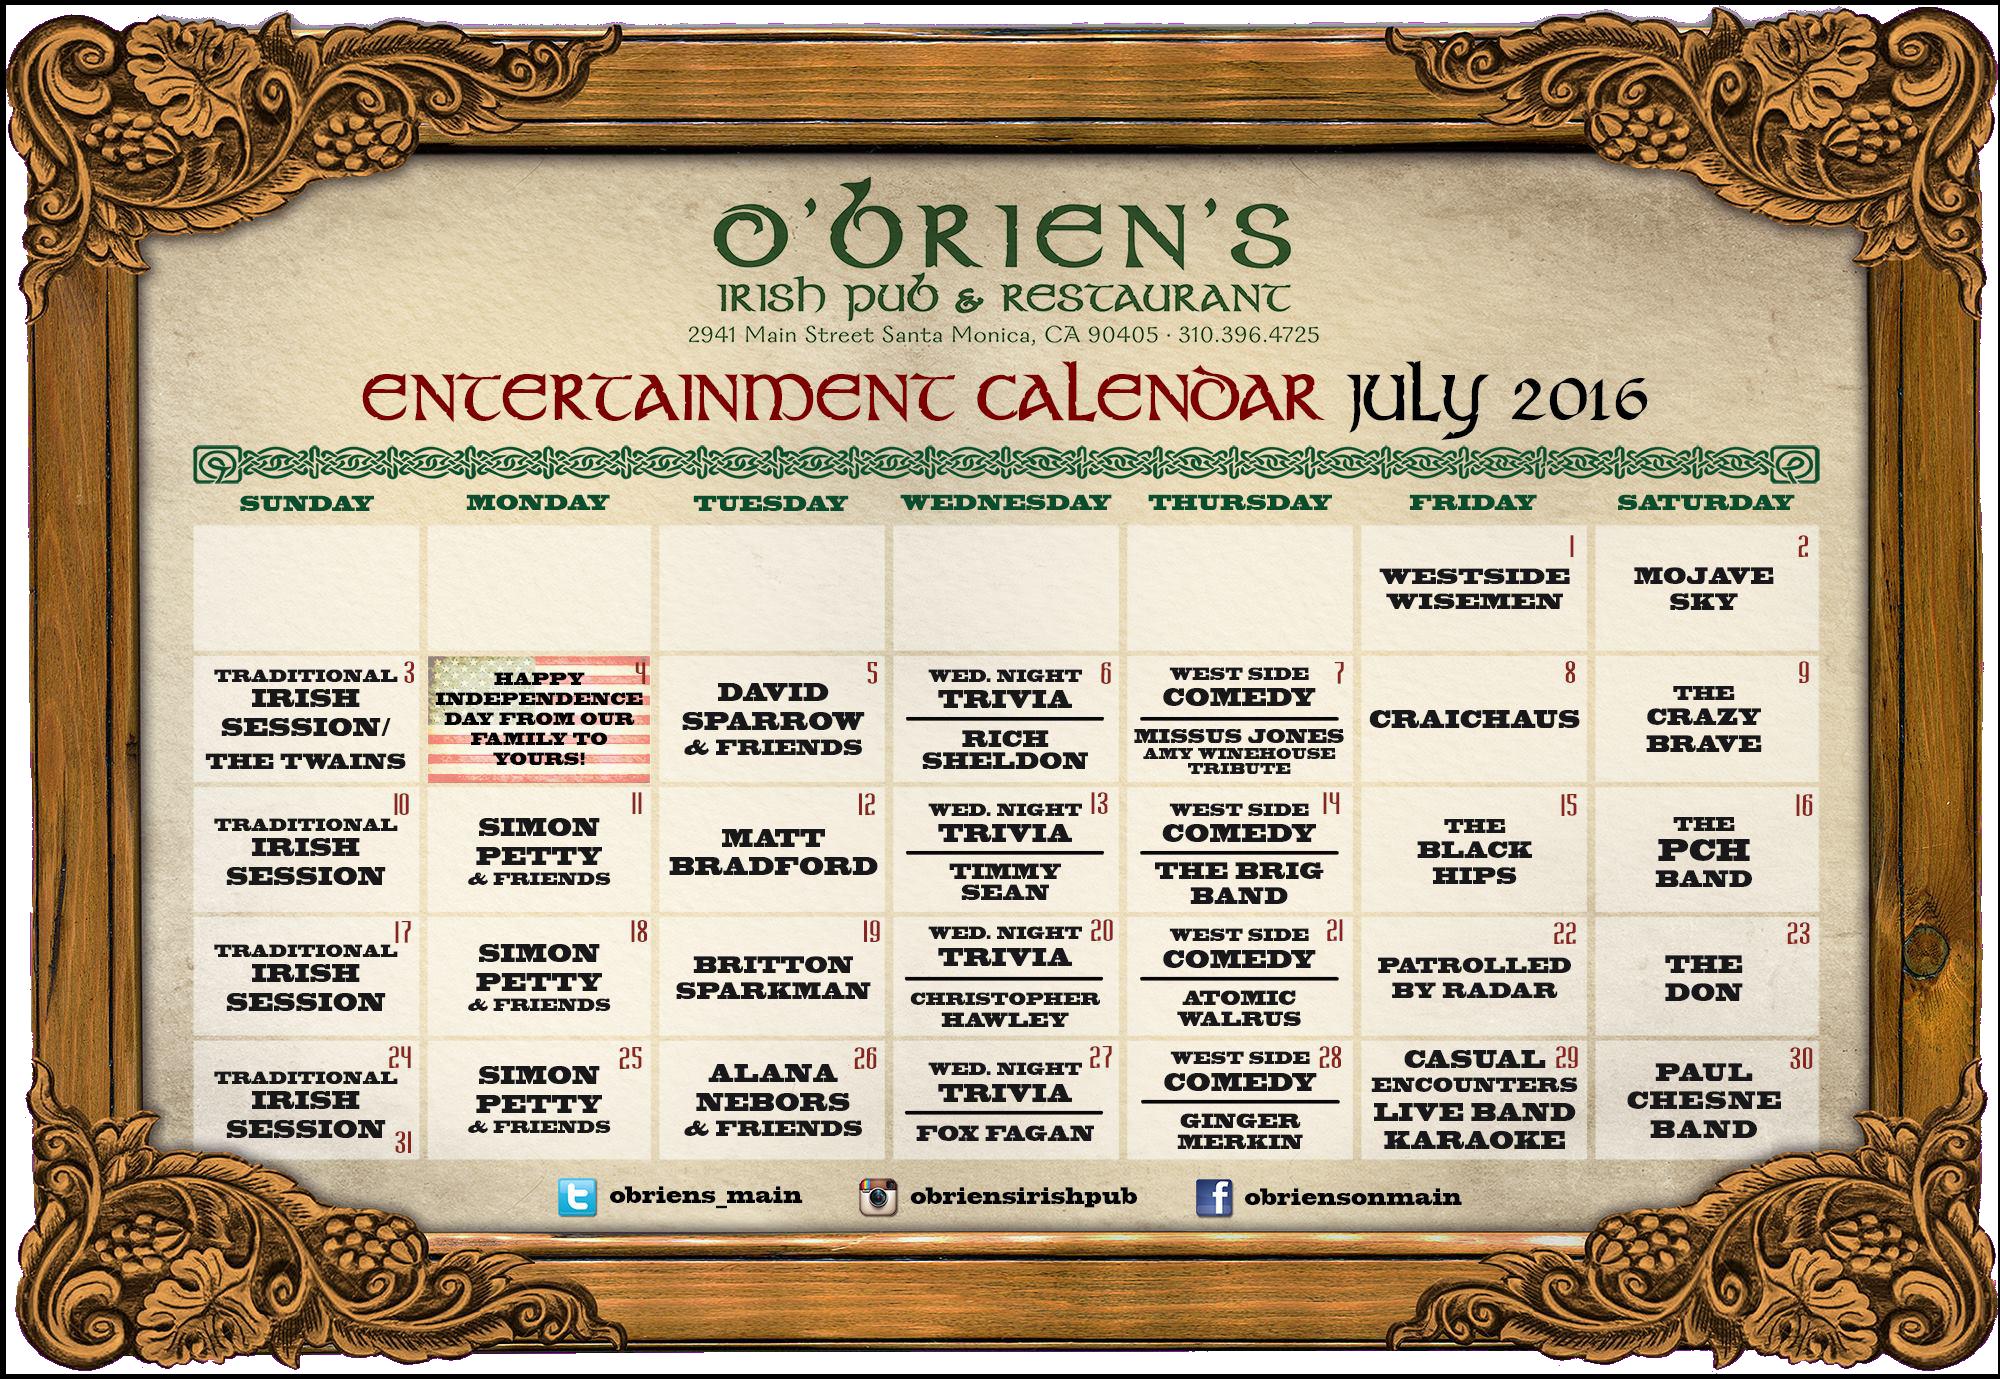 Live Music and Events at O'Briens Irish Pub on Main St Santa Monica LA for July 2016